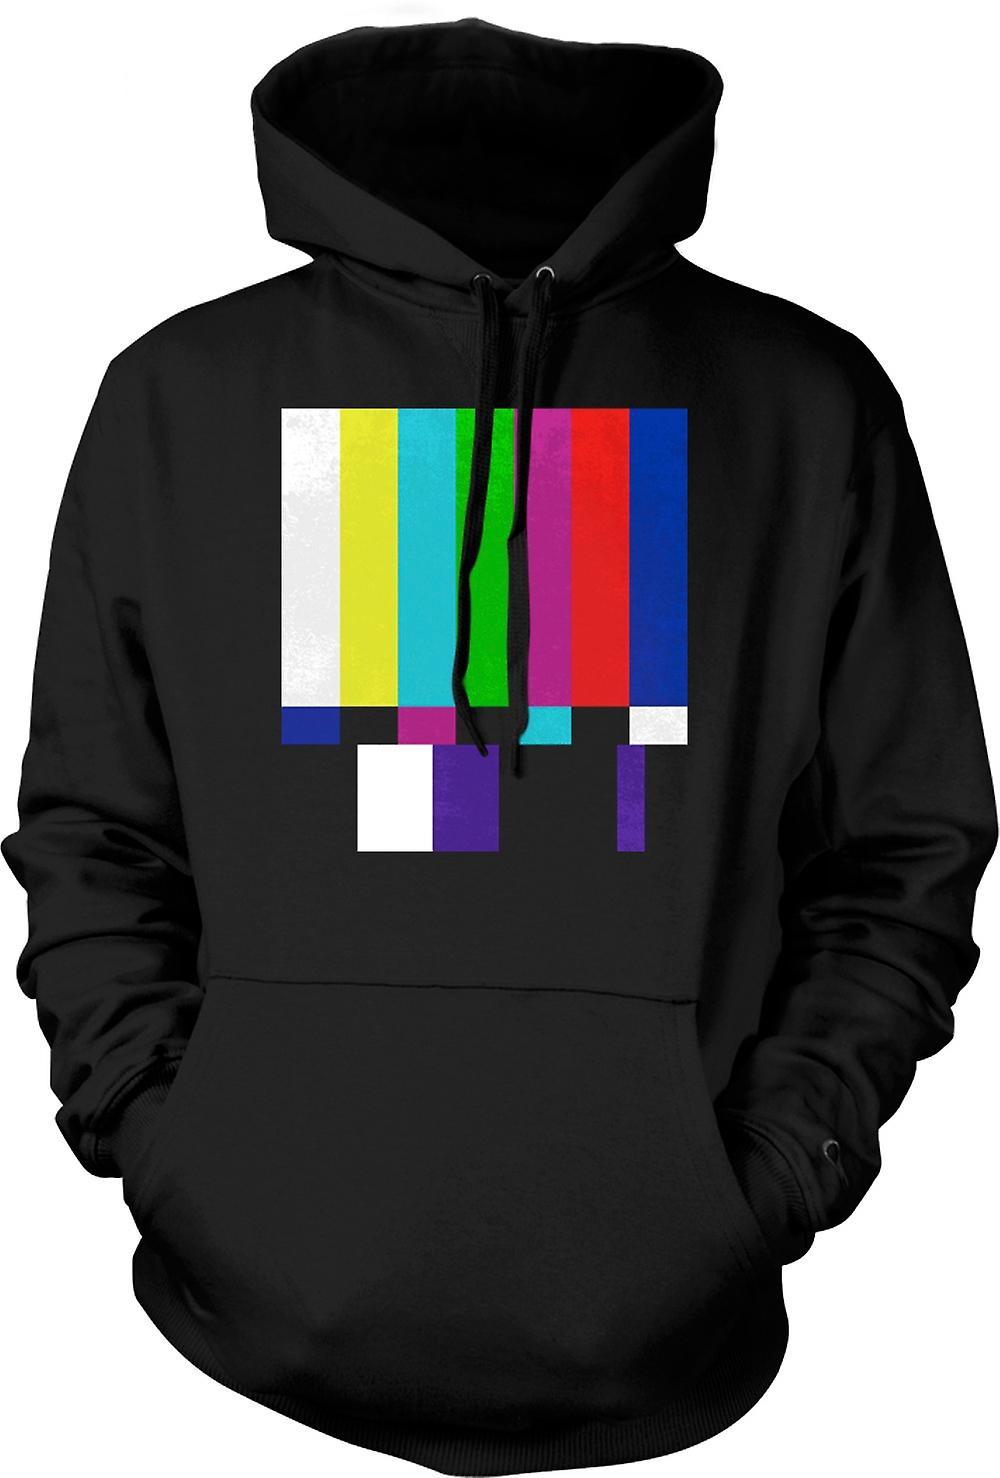 Black Sheep Clothing Mens Hoodie - TV Technical Screen 80s Retro Large